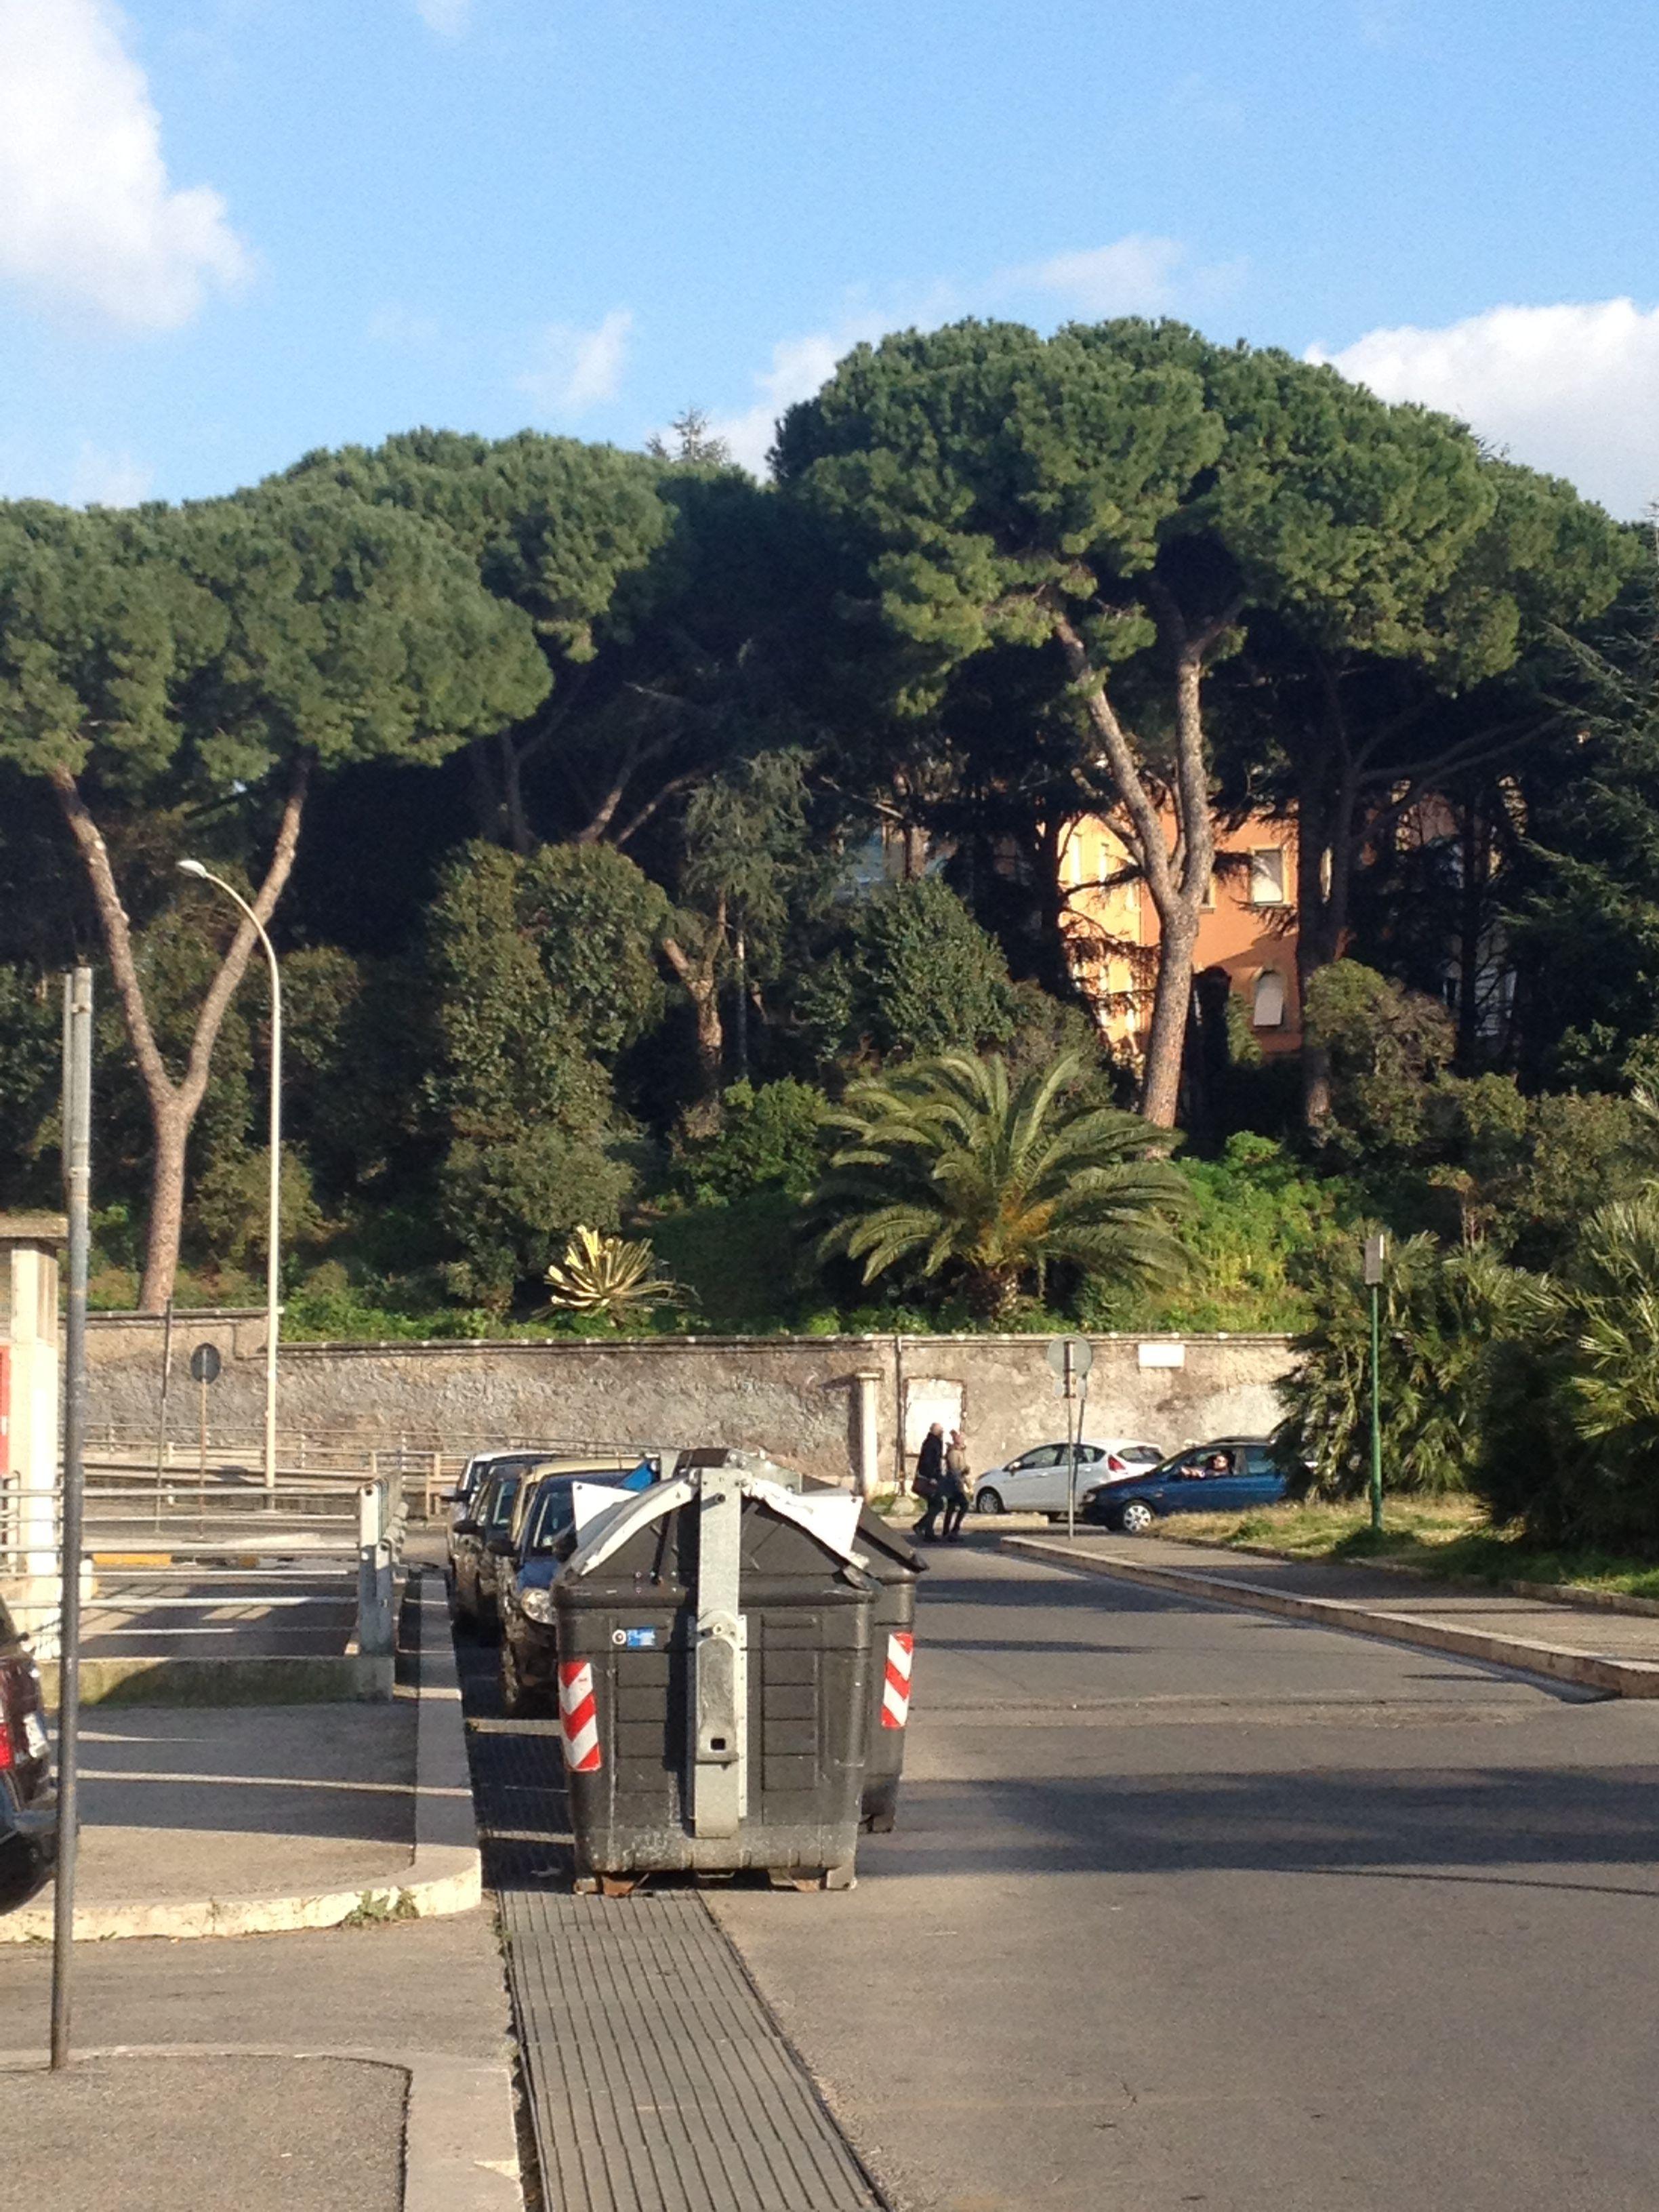 #Lezione #Inglese #domicilio #preparazione #esami #IELTS #Laureati #CELTA #DattiIlmeglio #Trionfale #Roma 063823338185